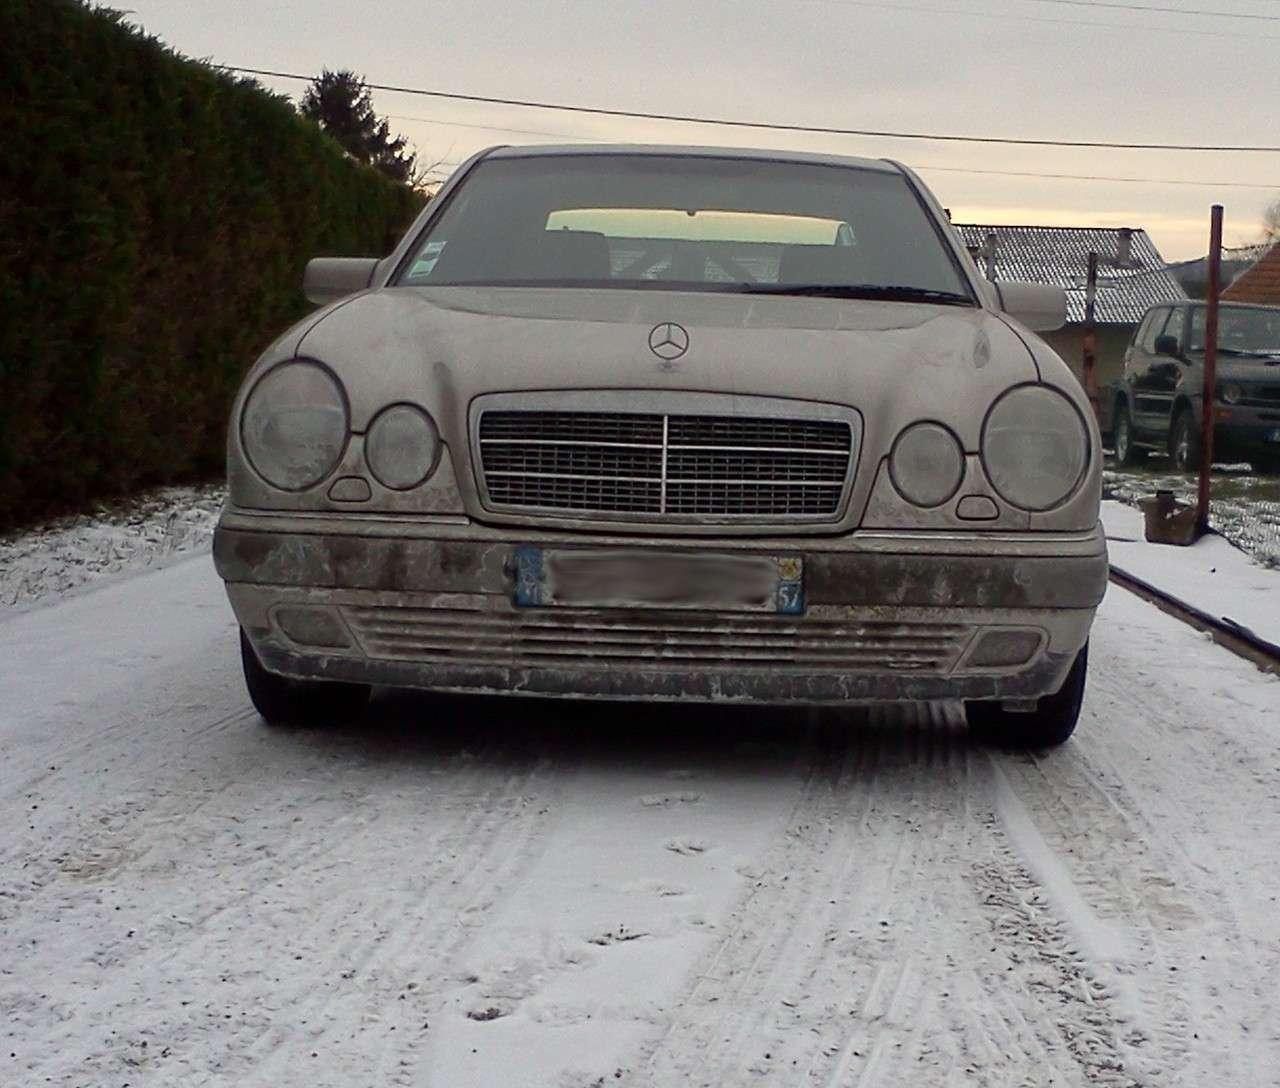 Présentation W210 290 TD Elegance BVA Berline Silver - Page 2 Img20116